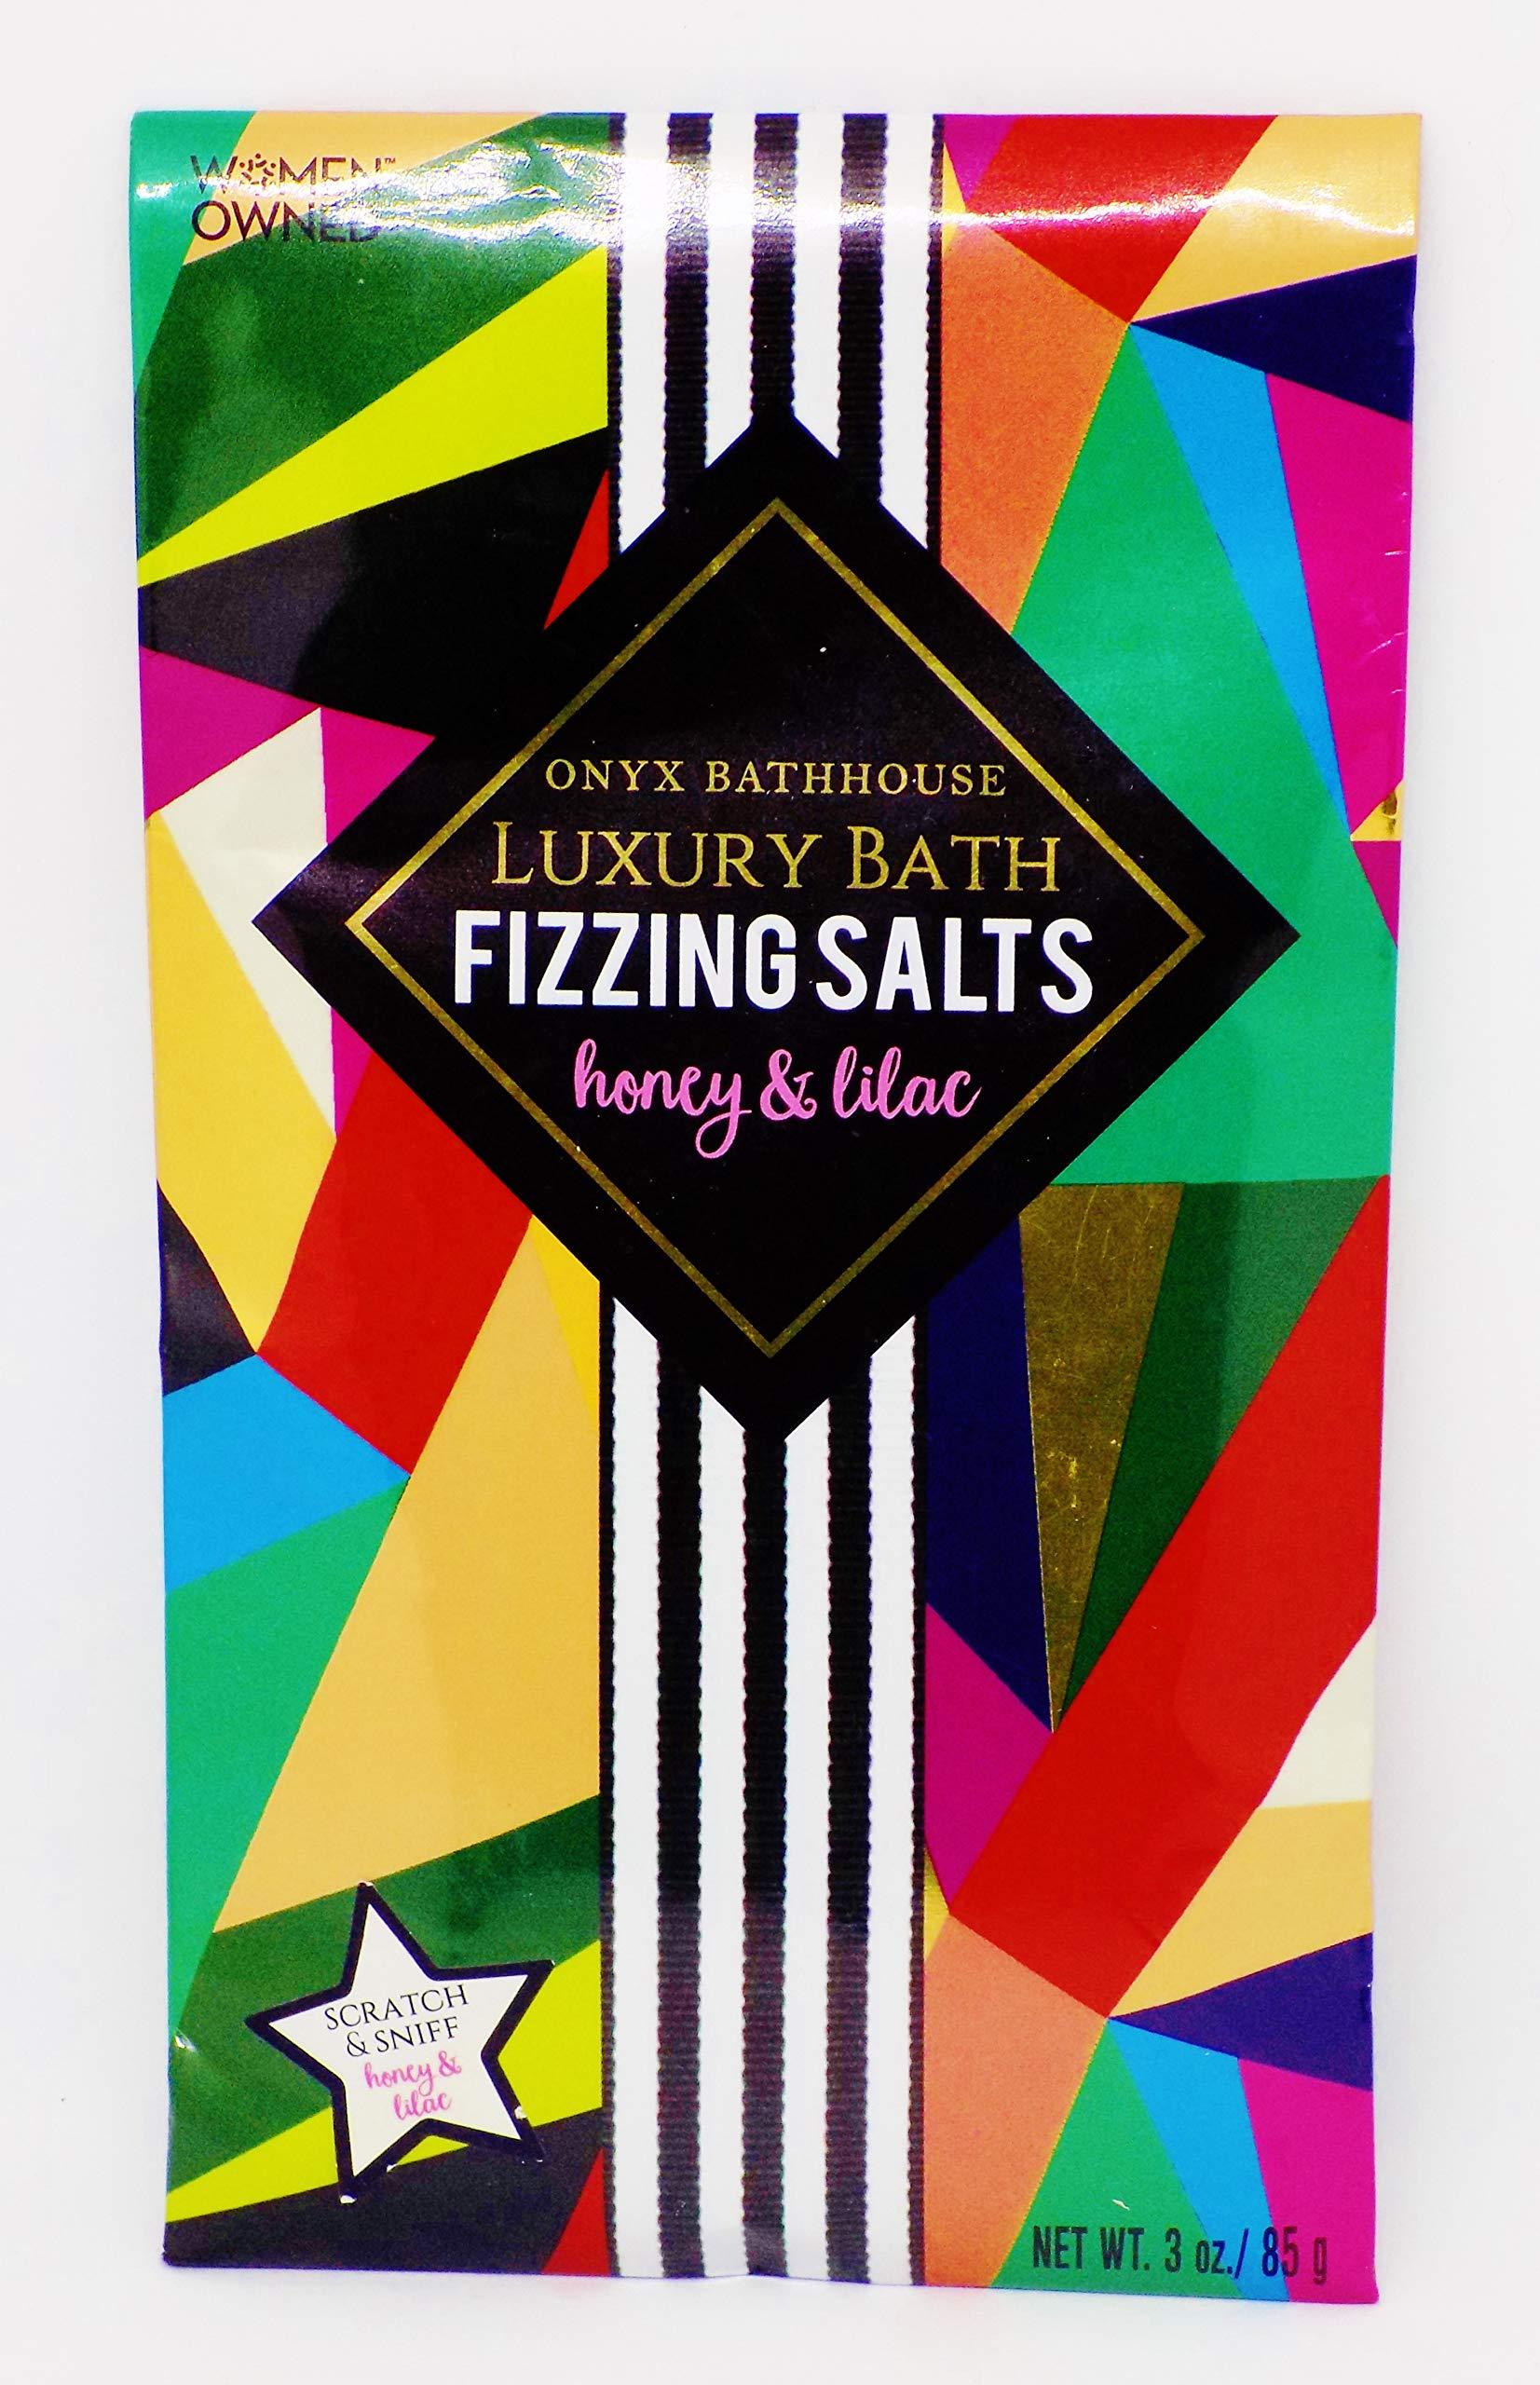 amazon.com - Onyx Bathhouse Fizzing Bath Salts, Honey & Lilac Scented, 3 oz